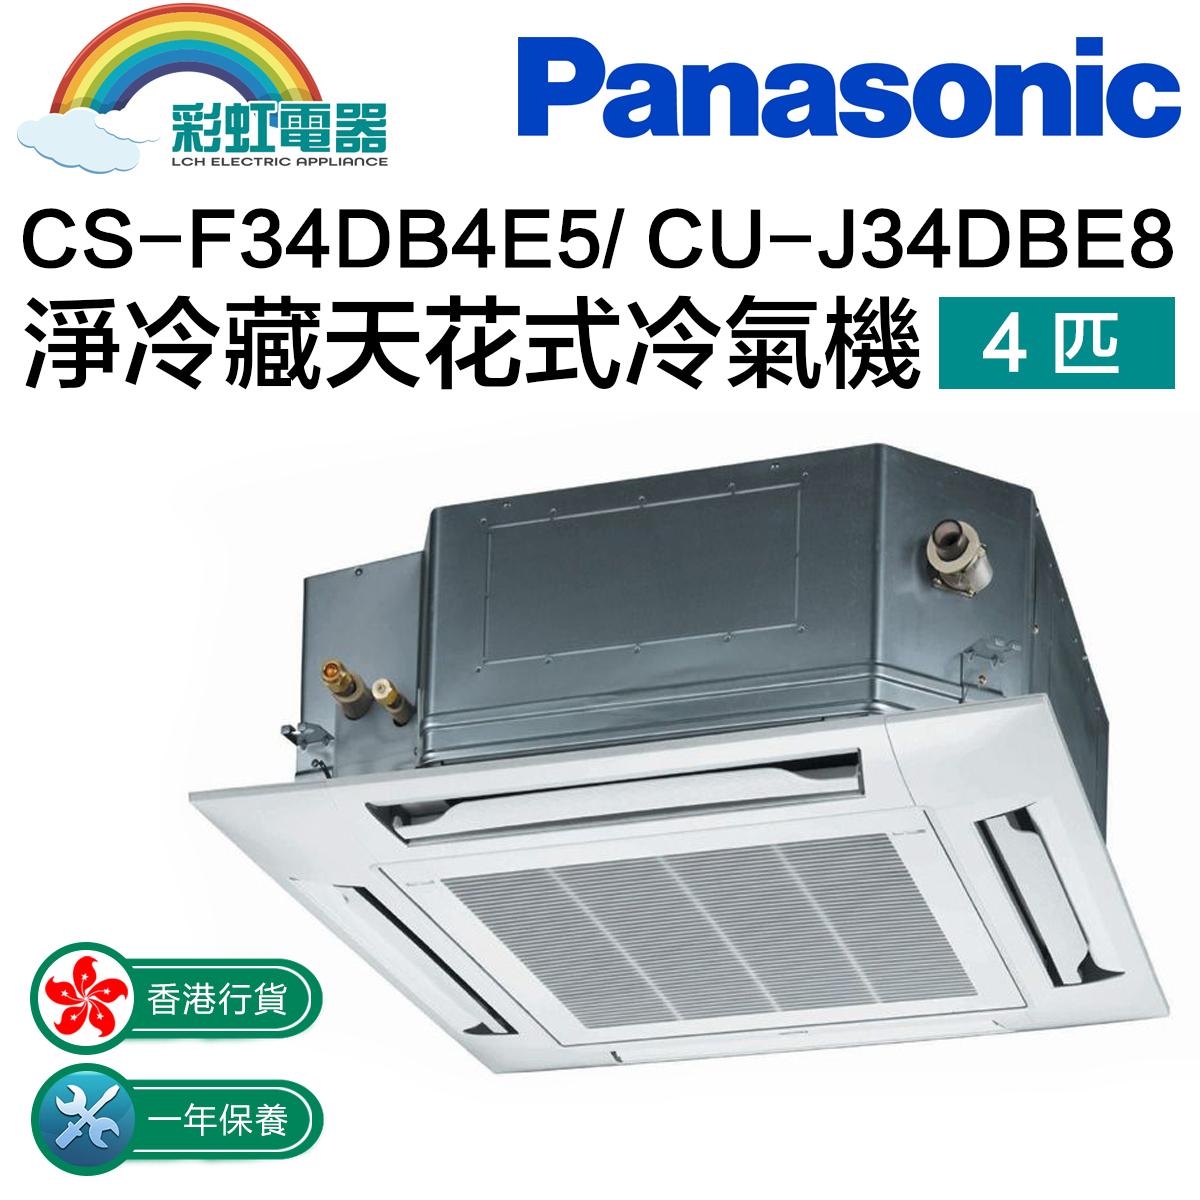 CS-F34DB4E5/ CU-J34DBE8 Net refrigerating day fancy air conditioner 4 horse